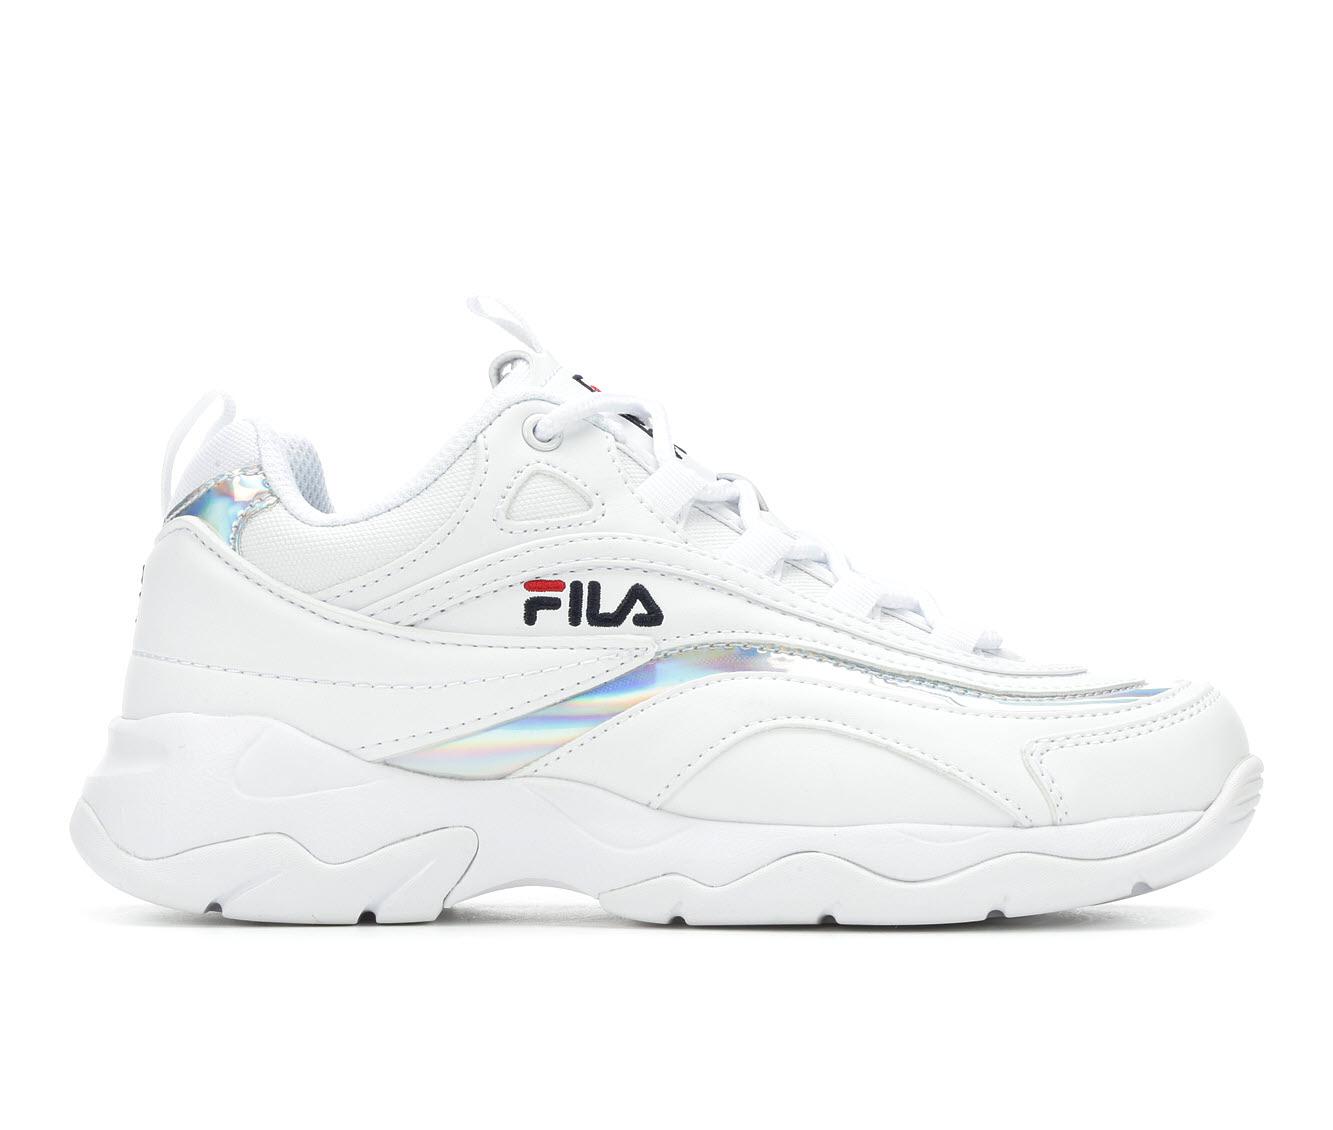 Fila Fila Ray Women's Athletic Shoe (White)